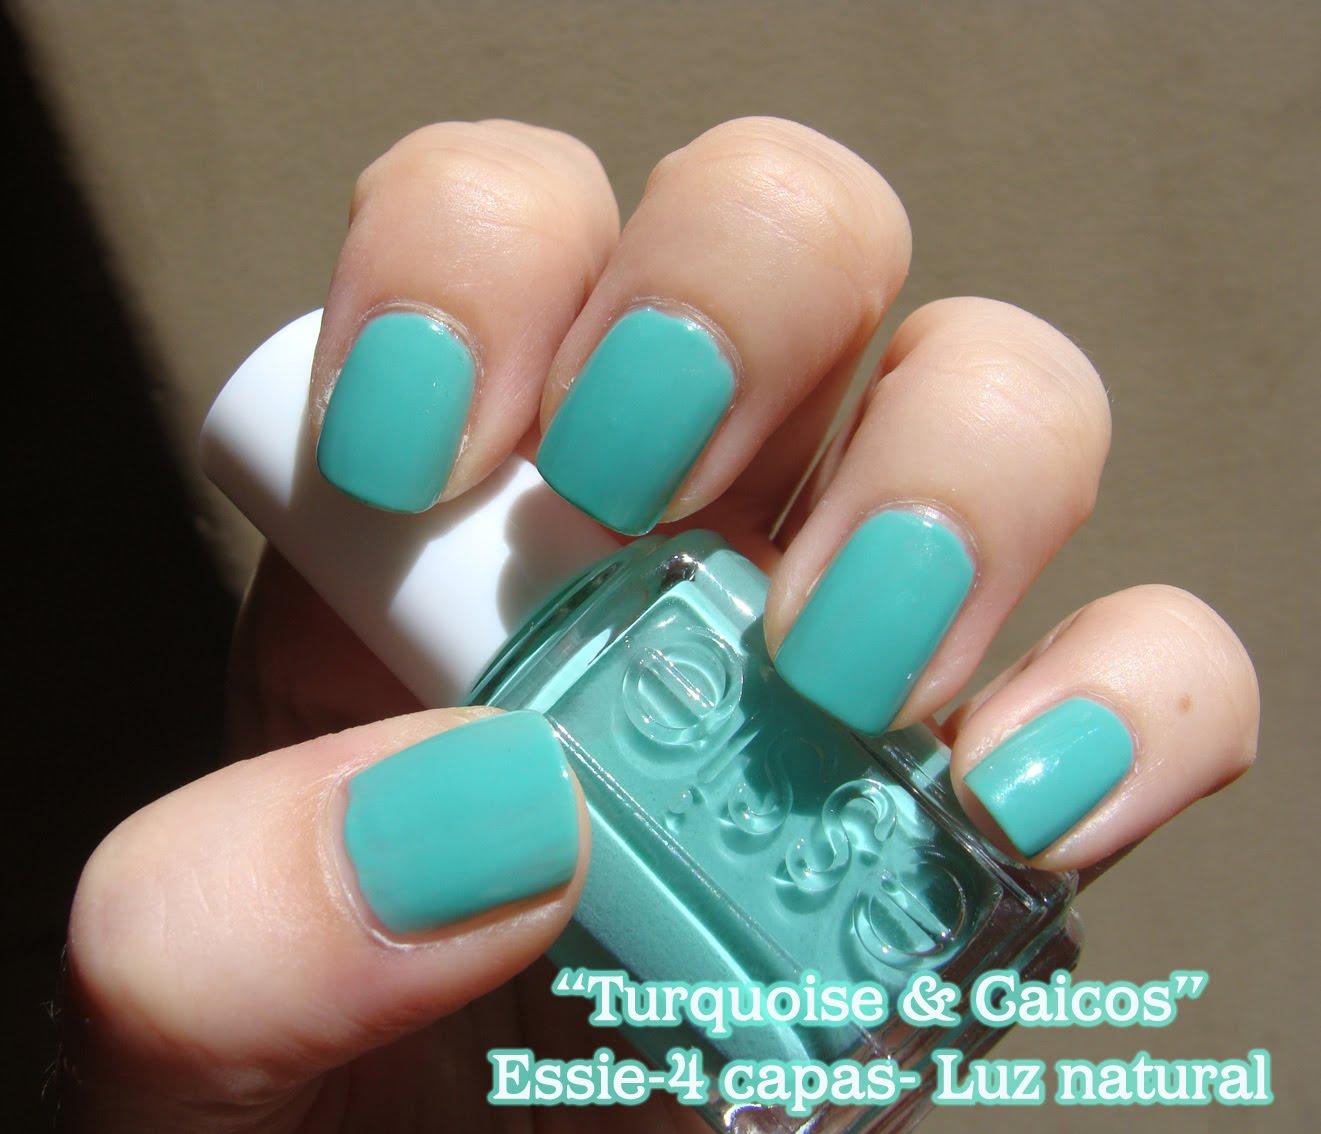 Esmaltes de Julie: Turquoise & Caicos de Essie: Divino